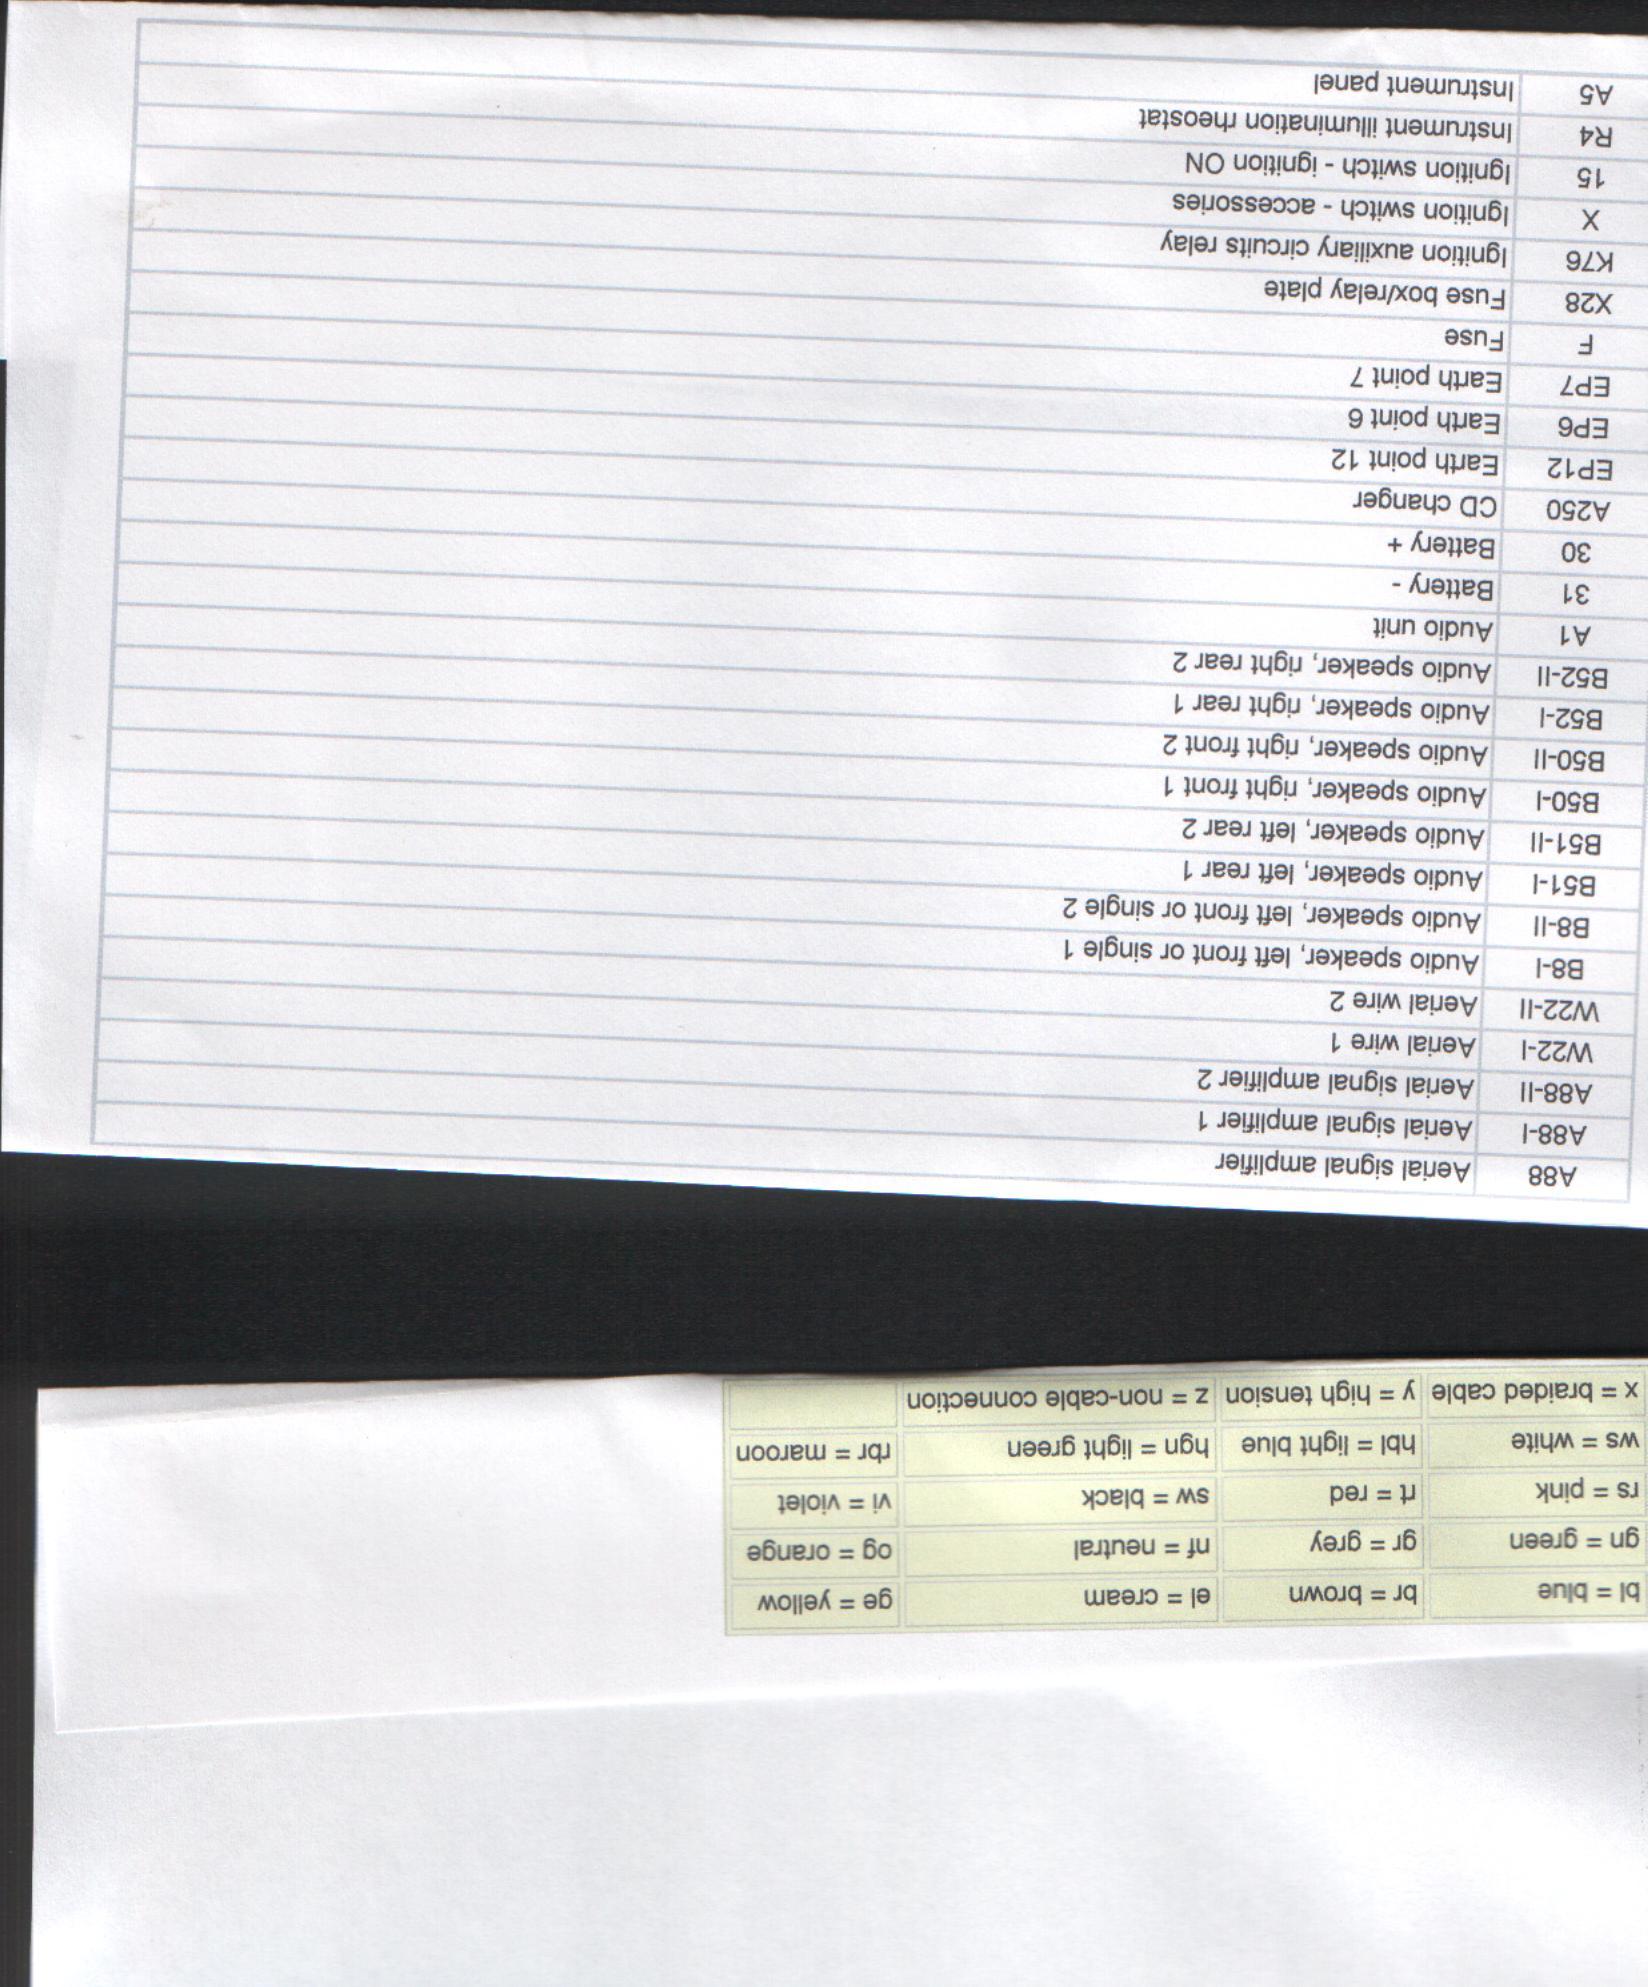 Needing A Speaker Wiring Diagram For 1998 Volvo S70 4dr